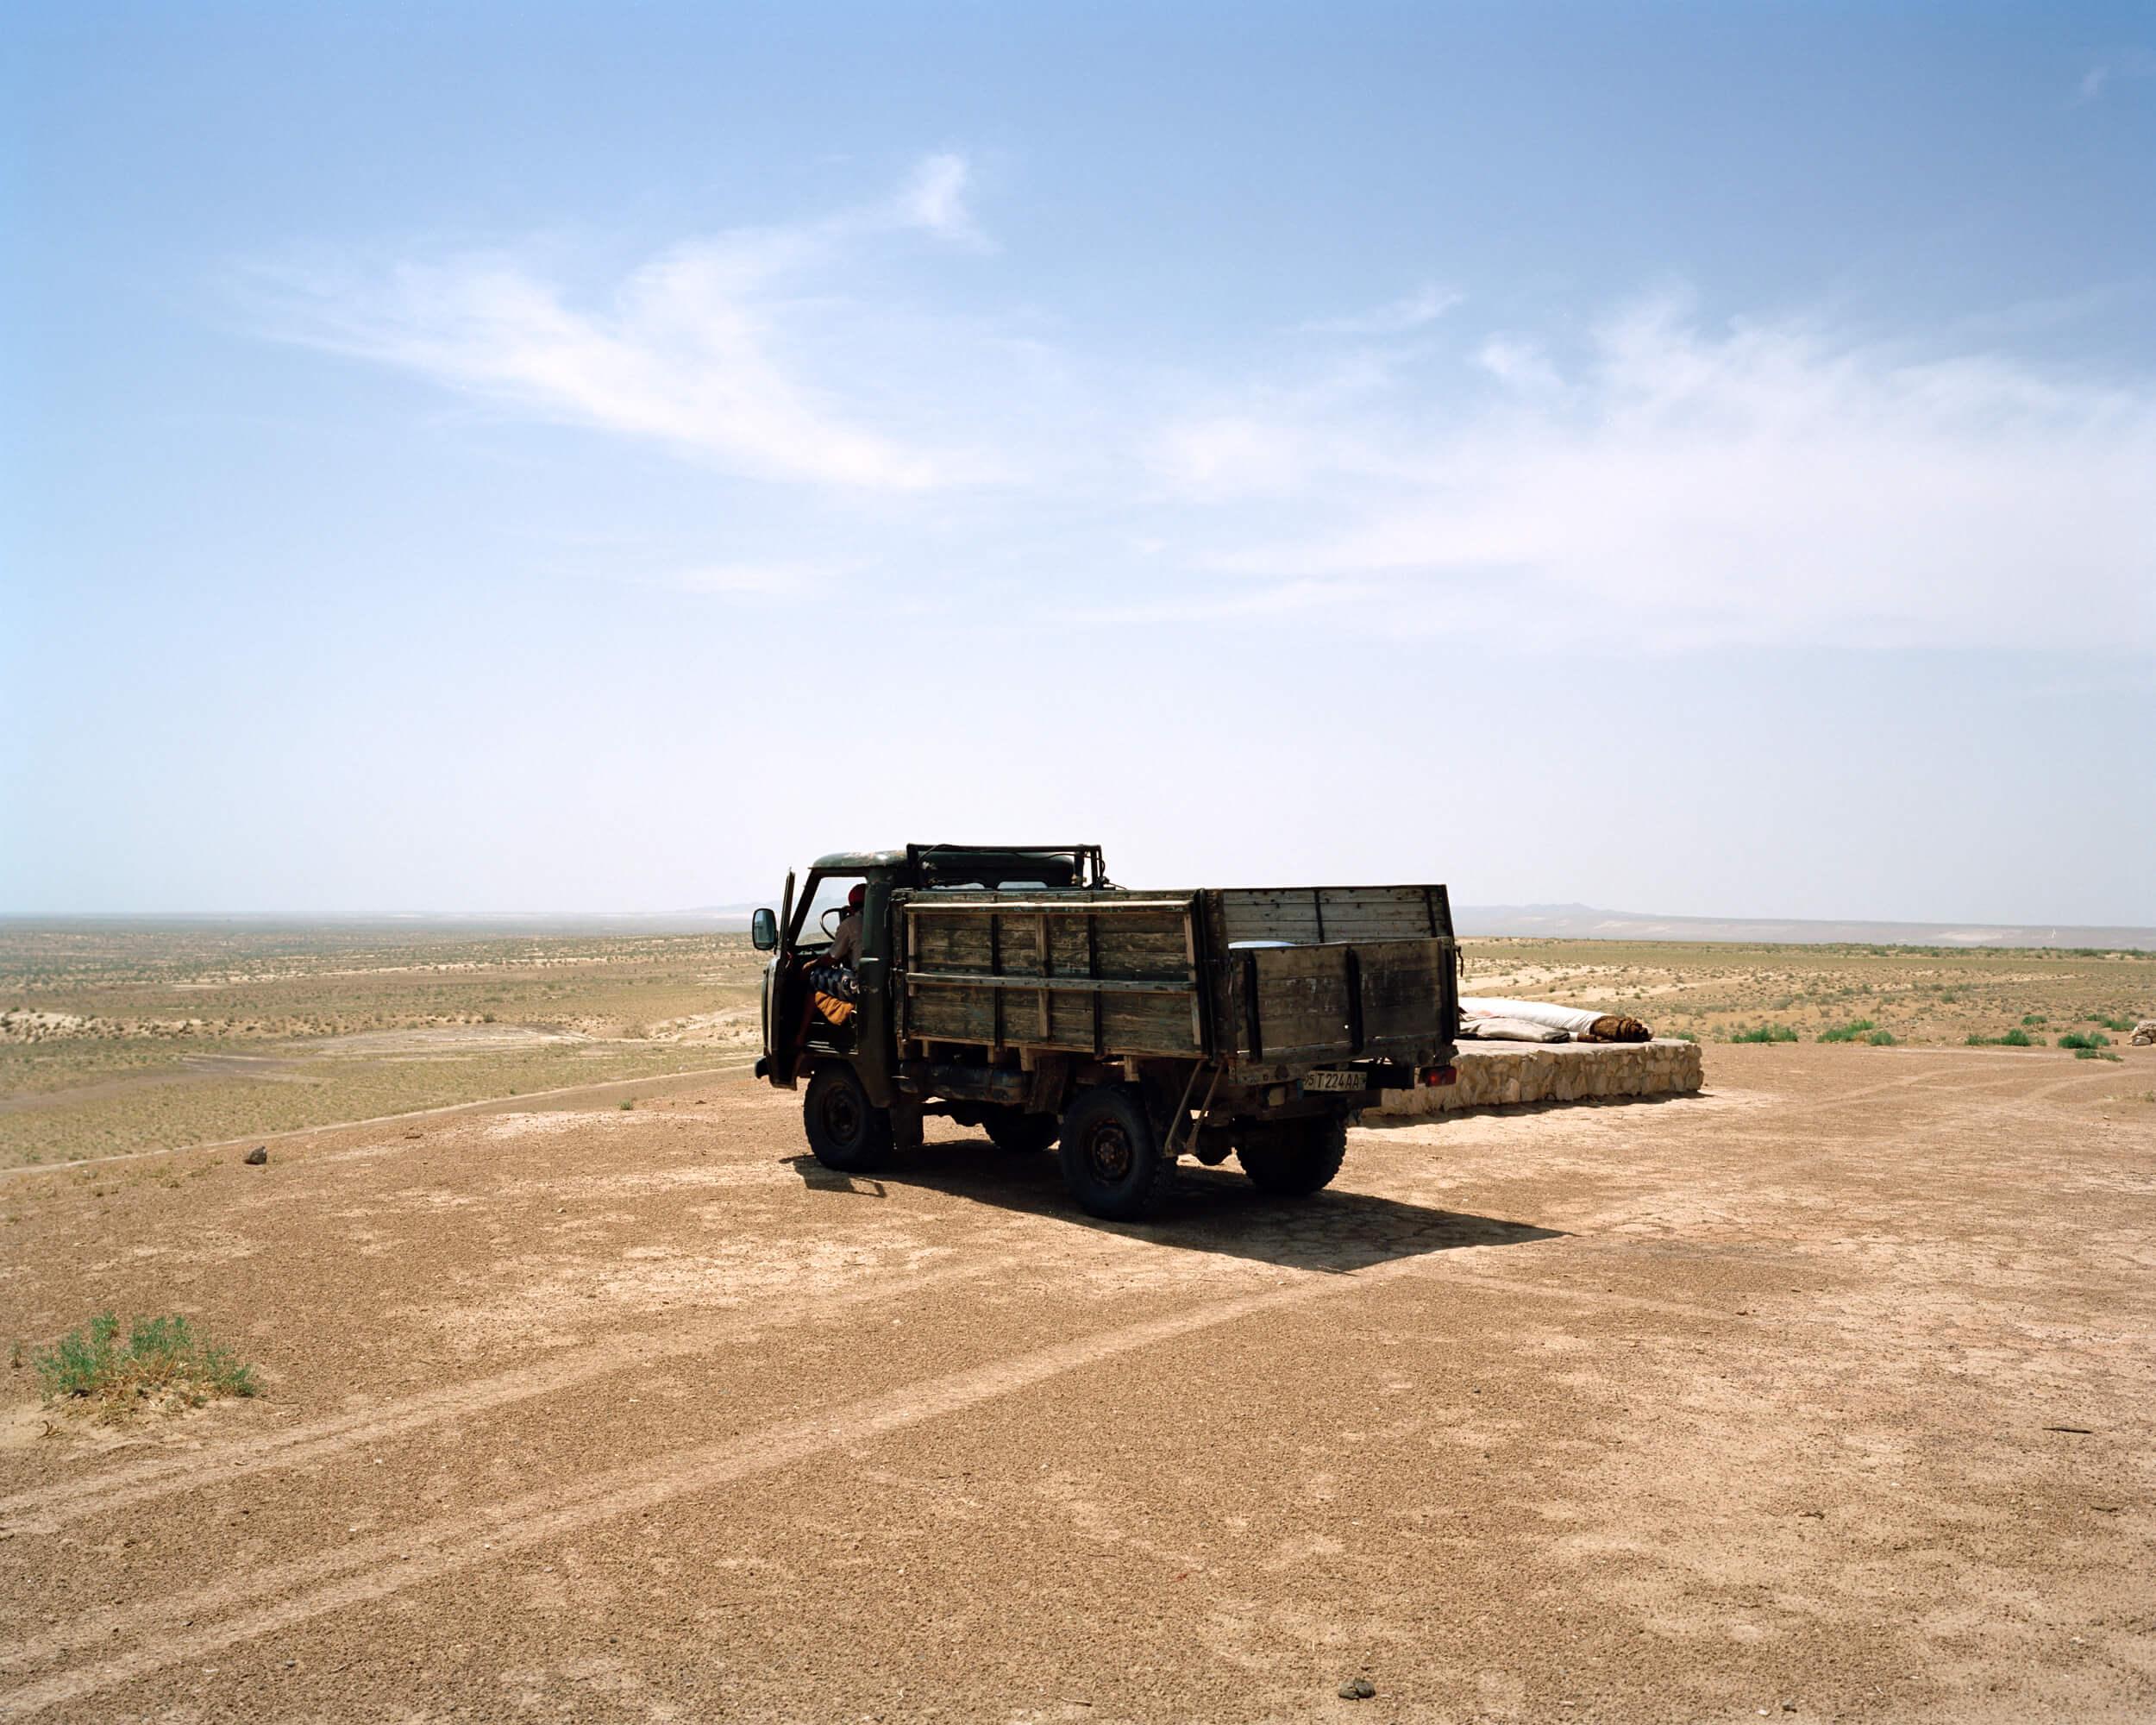 marco-barbieri-water-in-the-desert-44.jpg